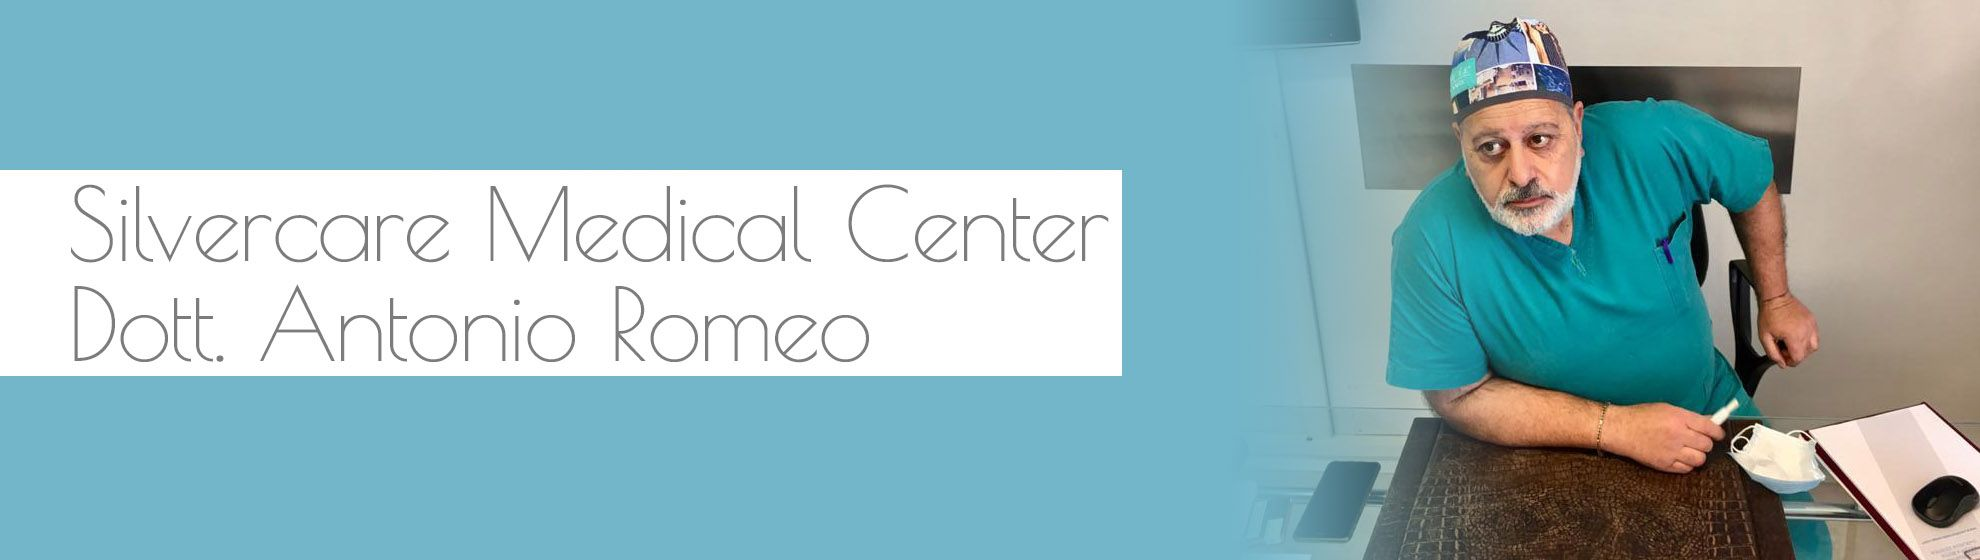 Silvercare Medical Center - Dott. Antonio Romeo